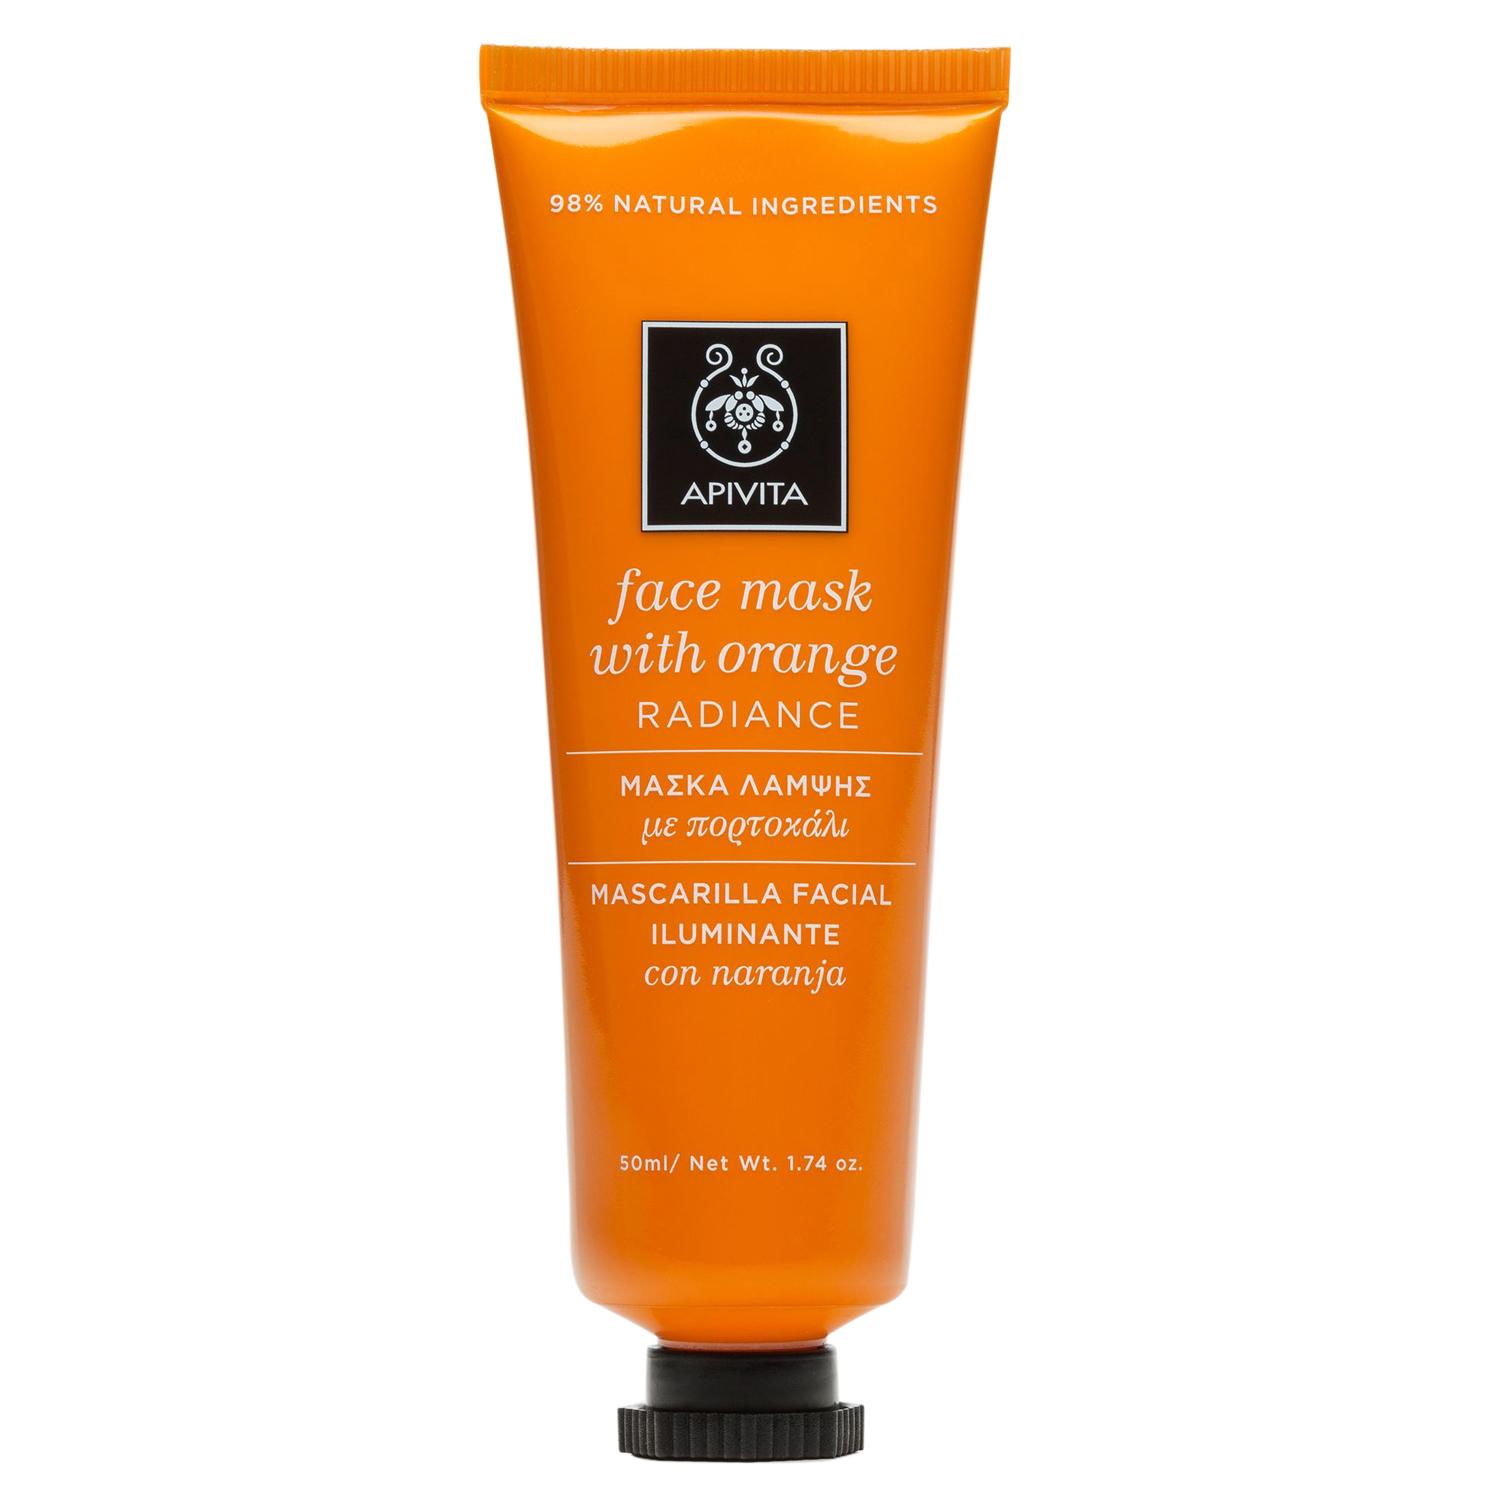 Apivita Face Mask with Orange Μάσκα Λάμψης για Θαμπές Επιδερμίδες με Πορτοκάλι, Όλοι οι Τύποι Δέρματος 50ml